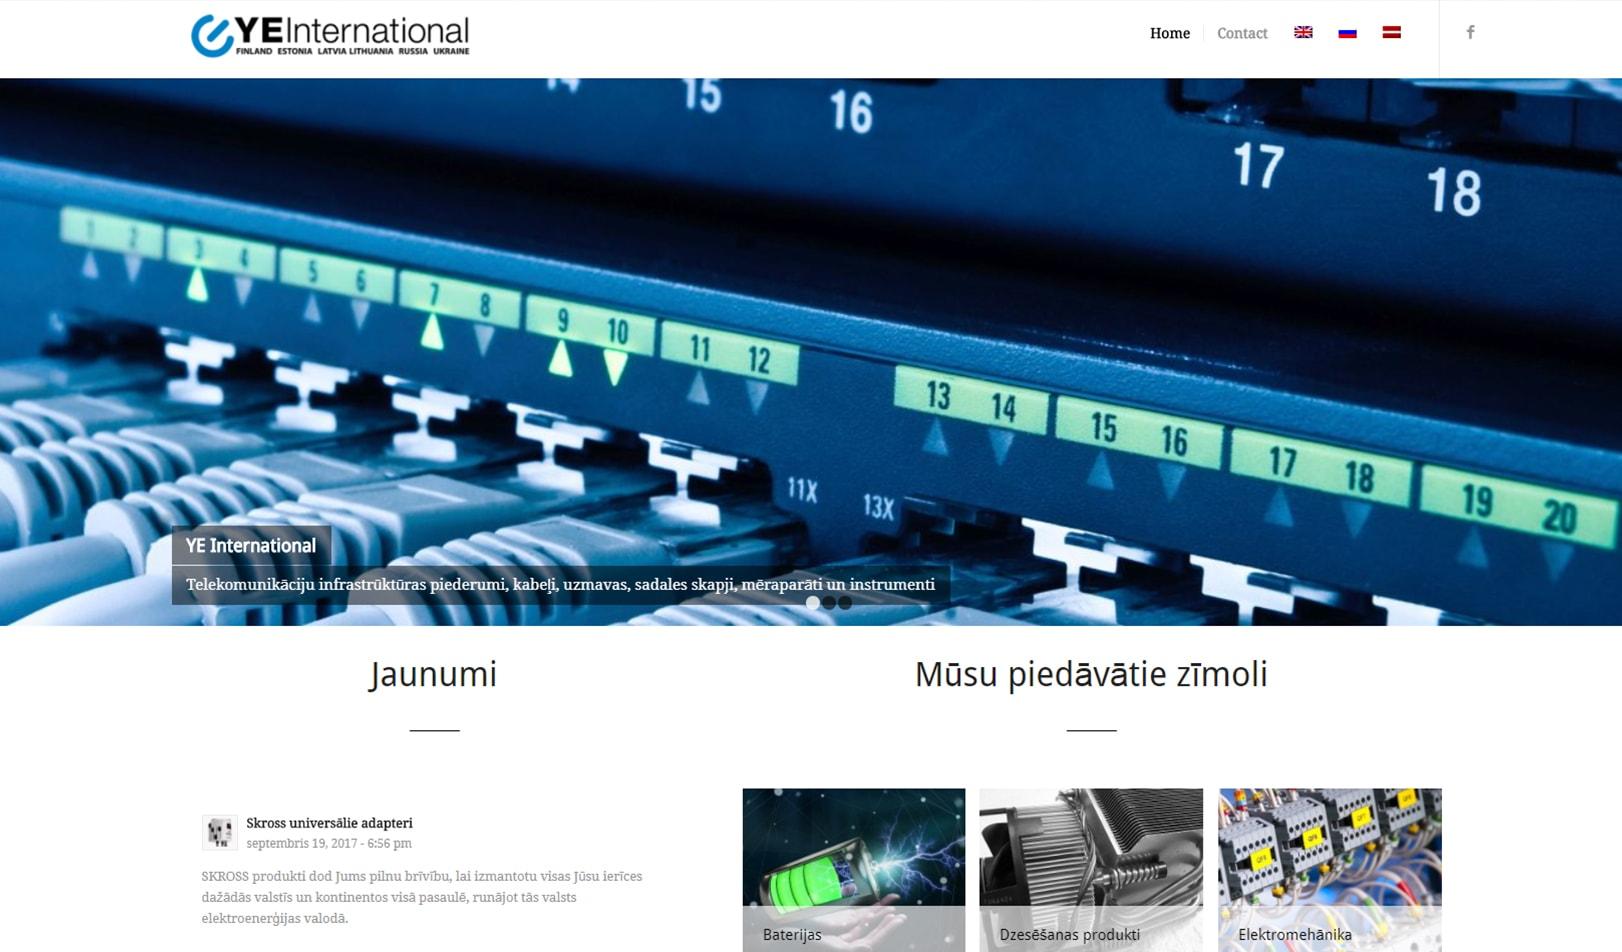 Корпоративный сайт для дистрибьютора электрооборудования